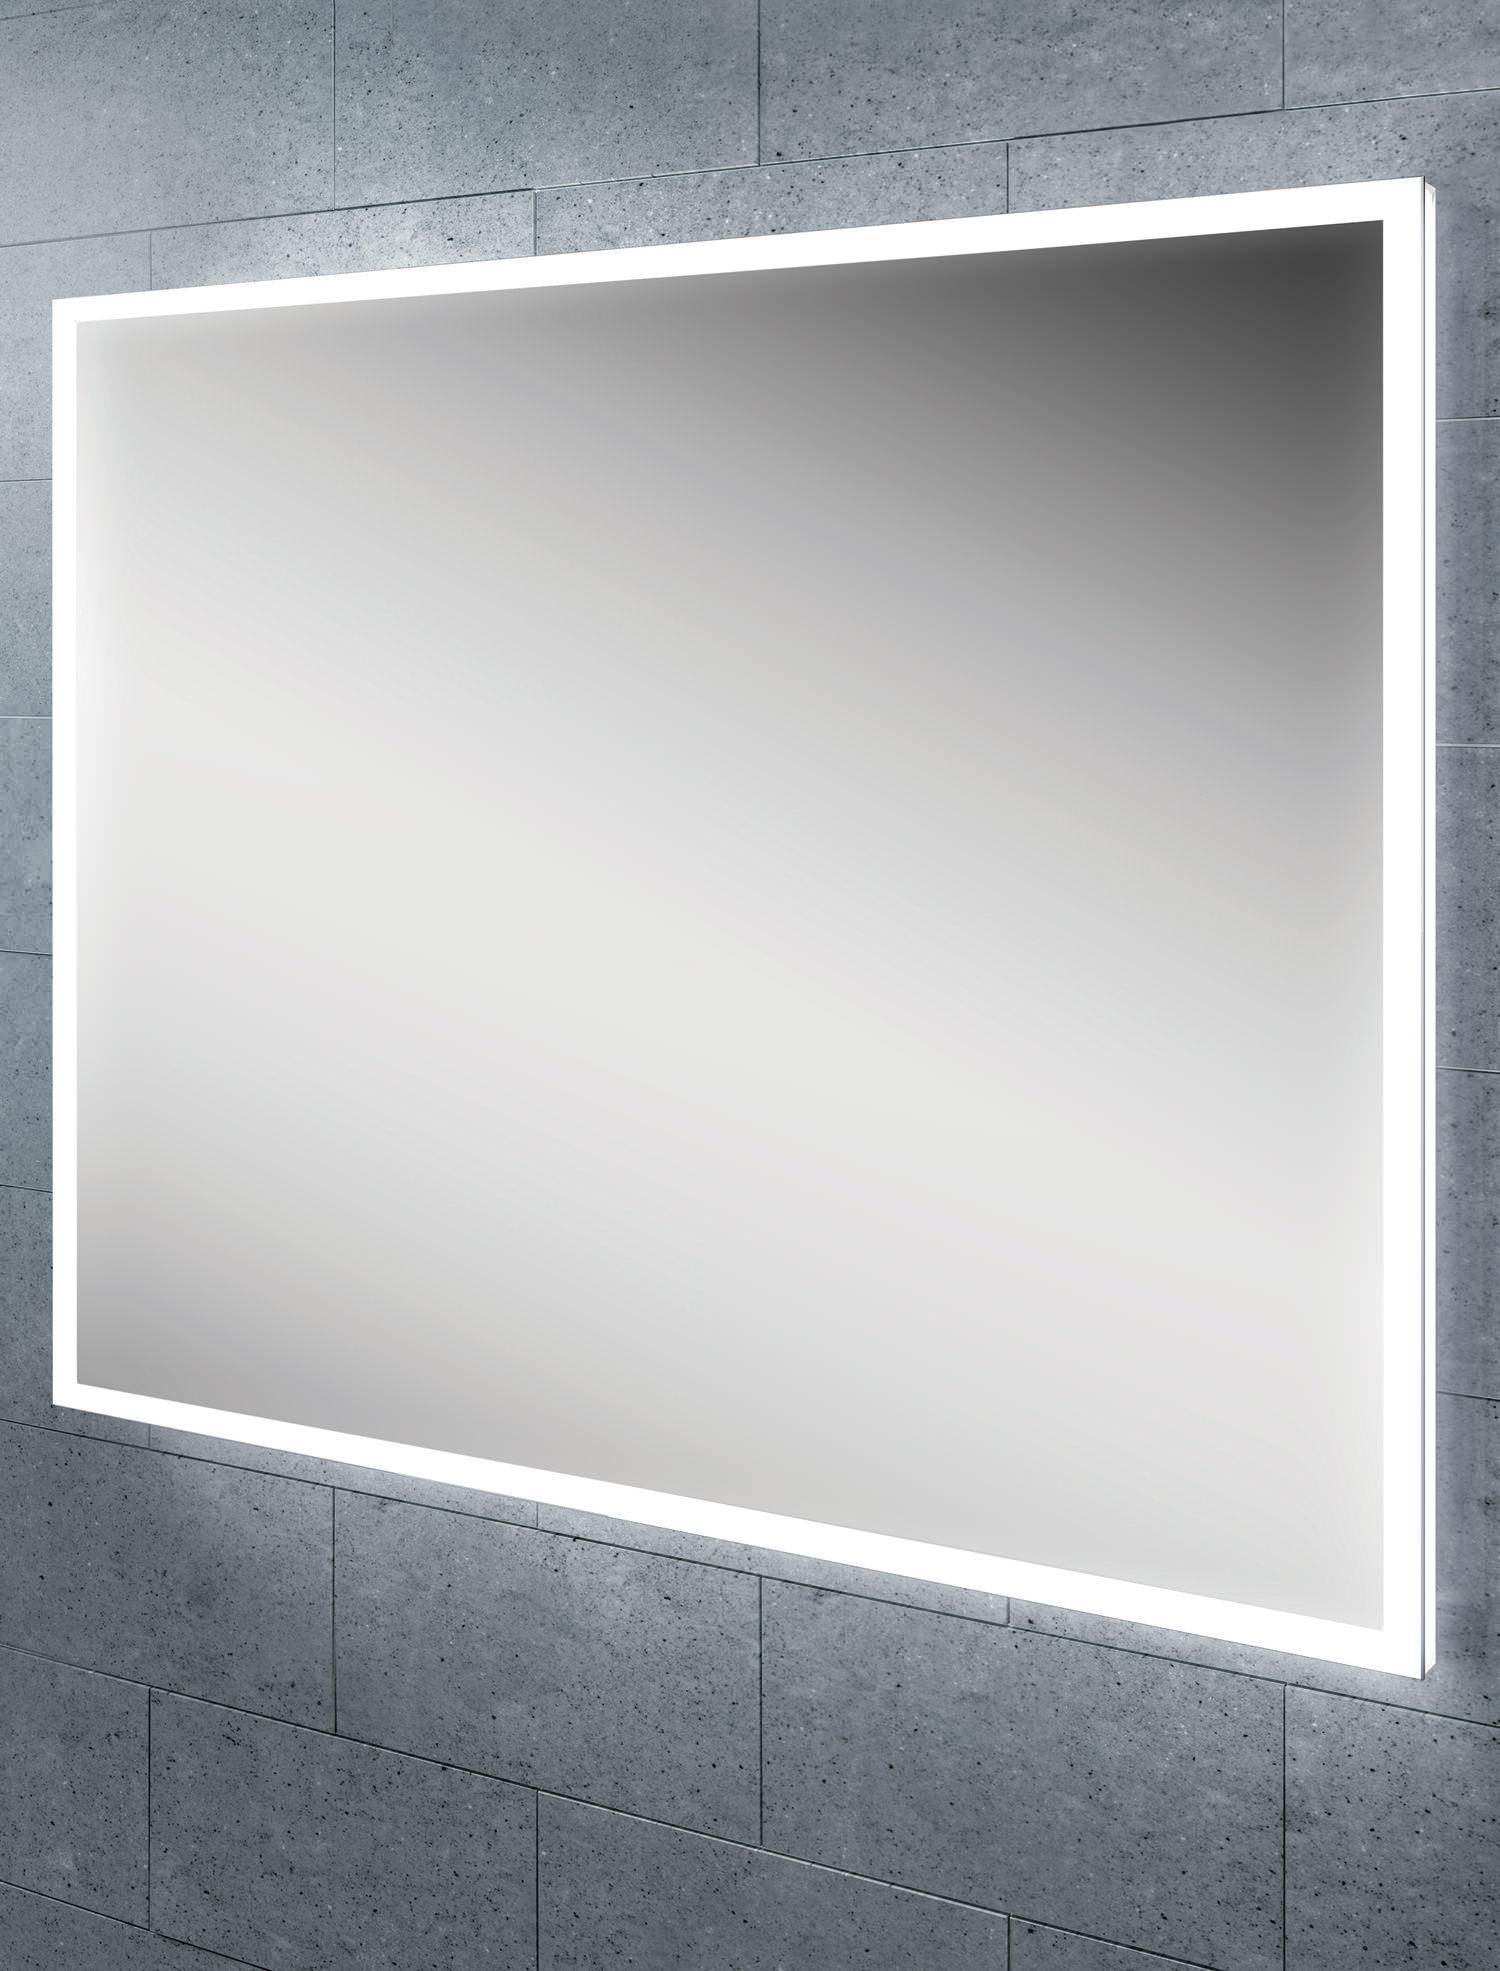 Hib globe 60 steam free led illuminated bathroom mirror for Mirror 60cm x 80cm